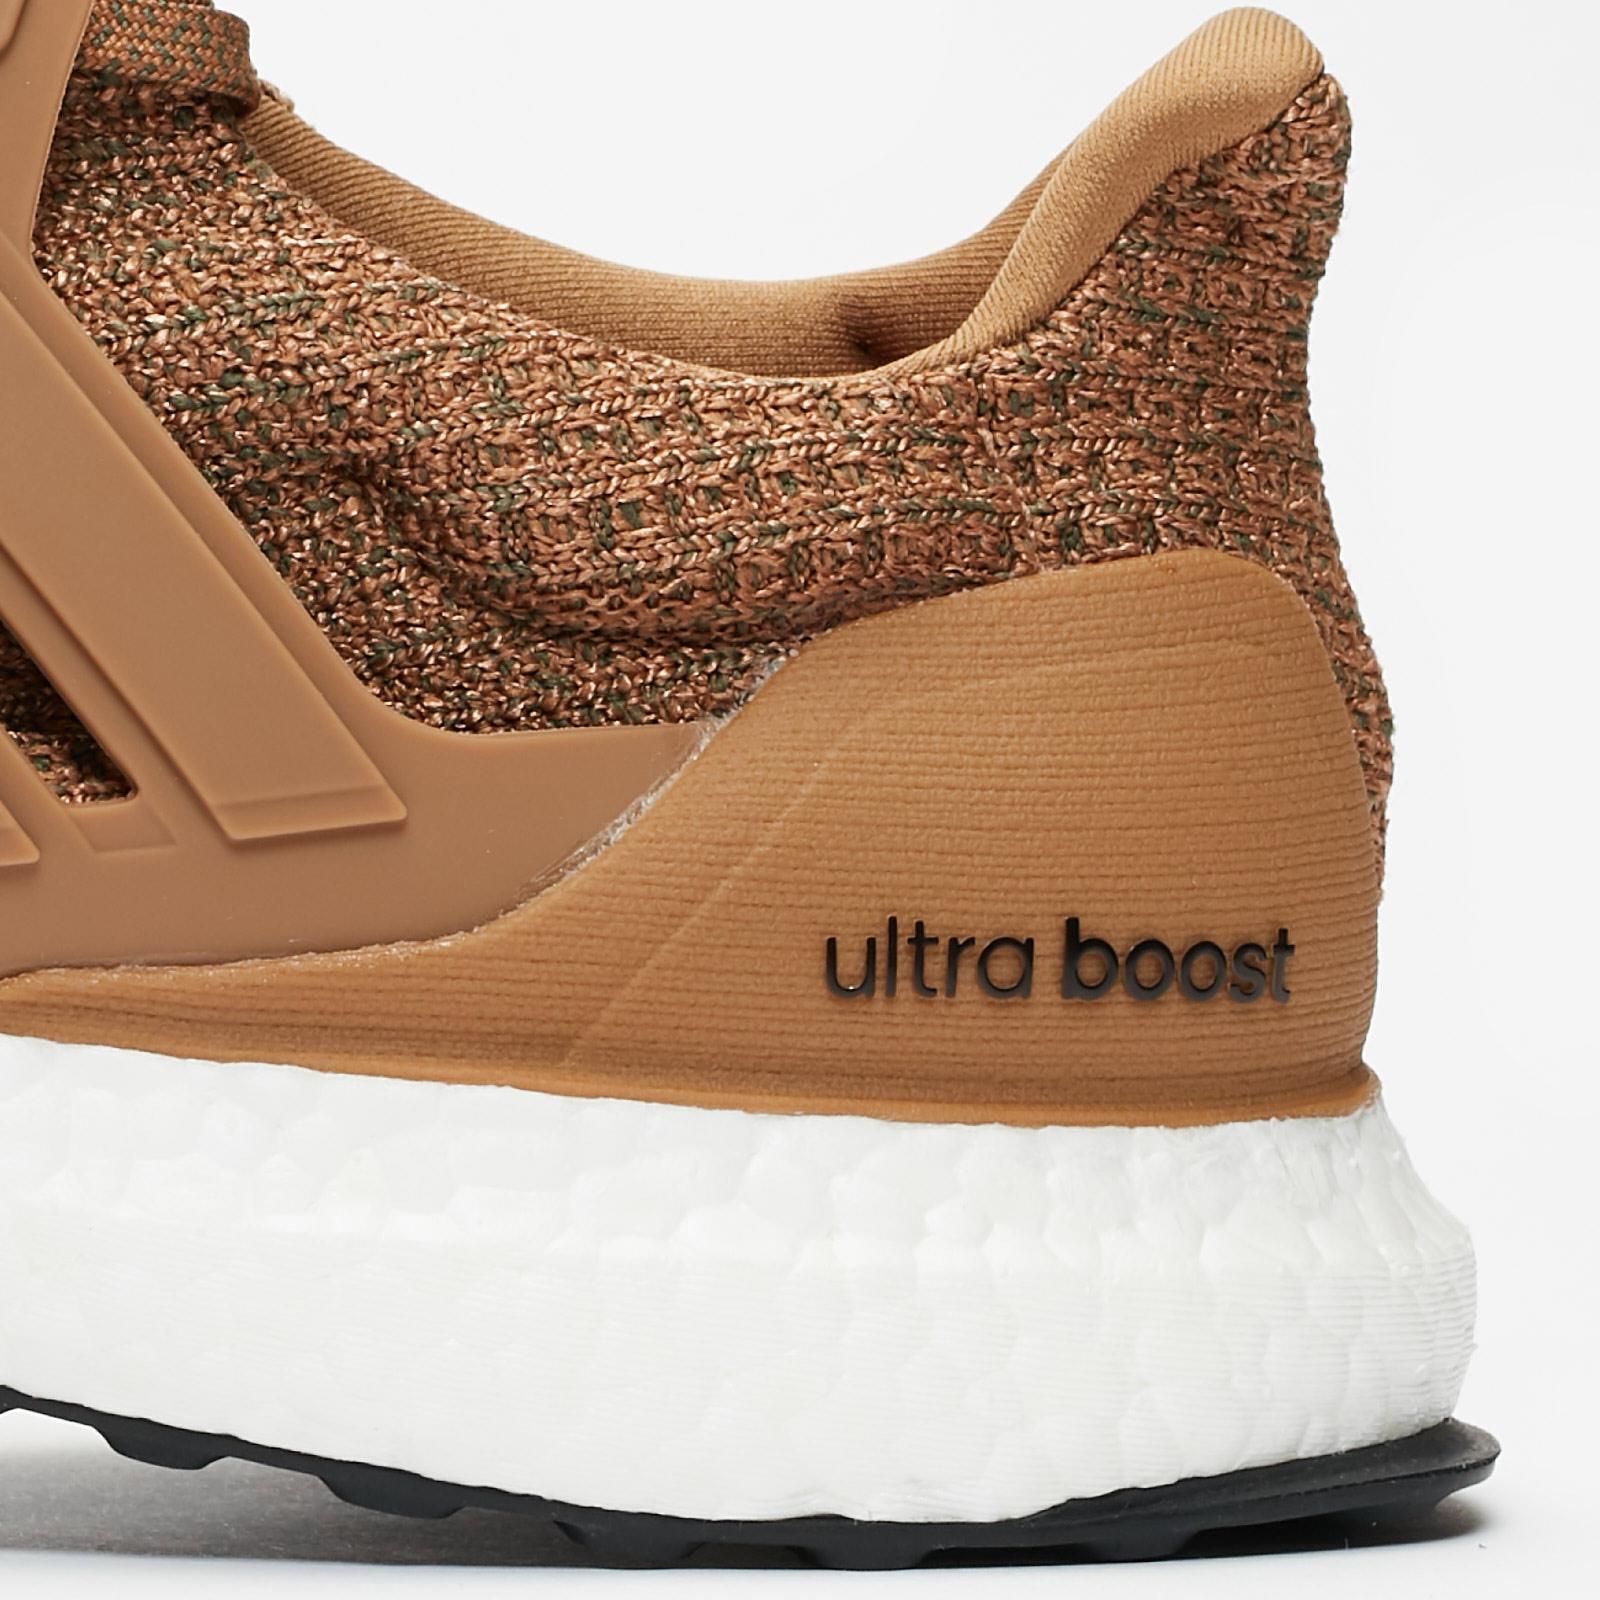 super popular aedbd 3b9eb adidas Ultraboost - Cm8118 - Sneakersnstuff | sneakers ...